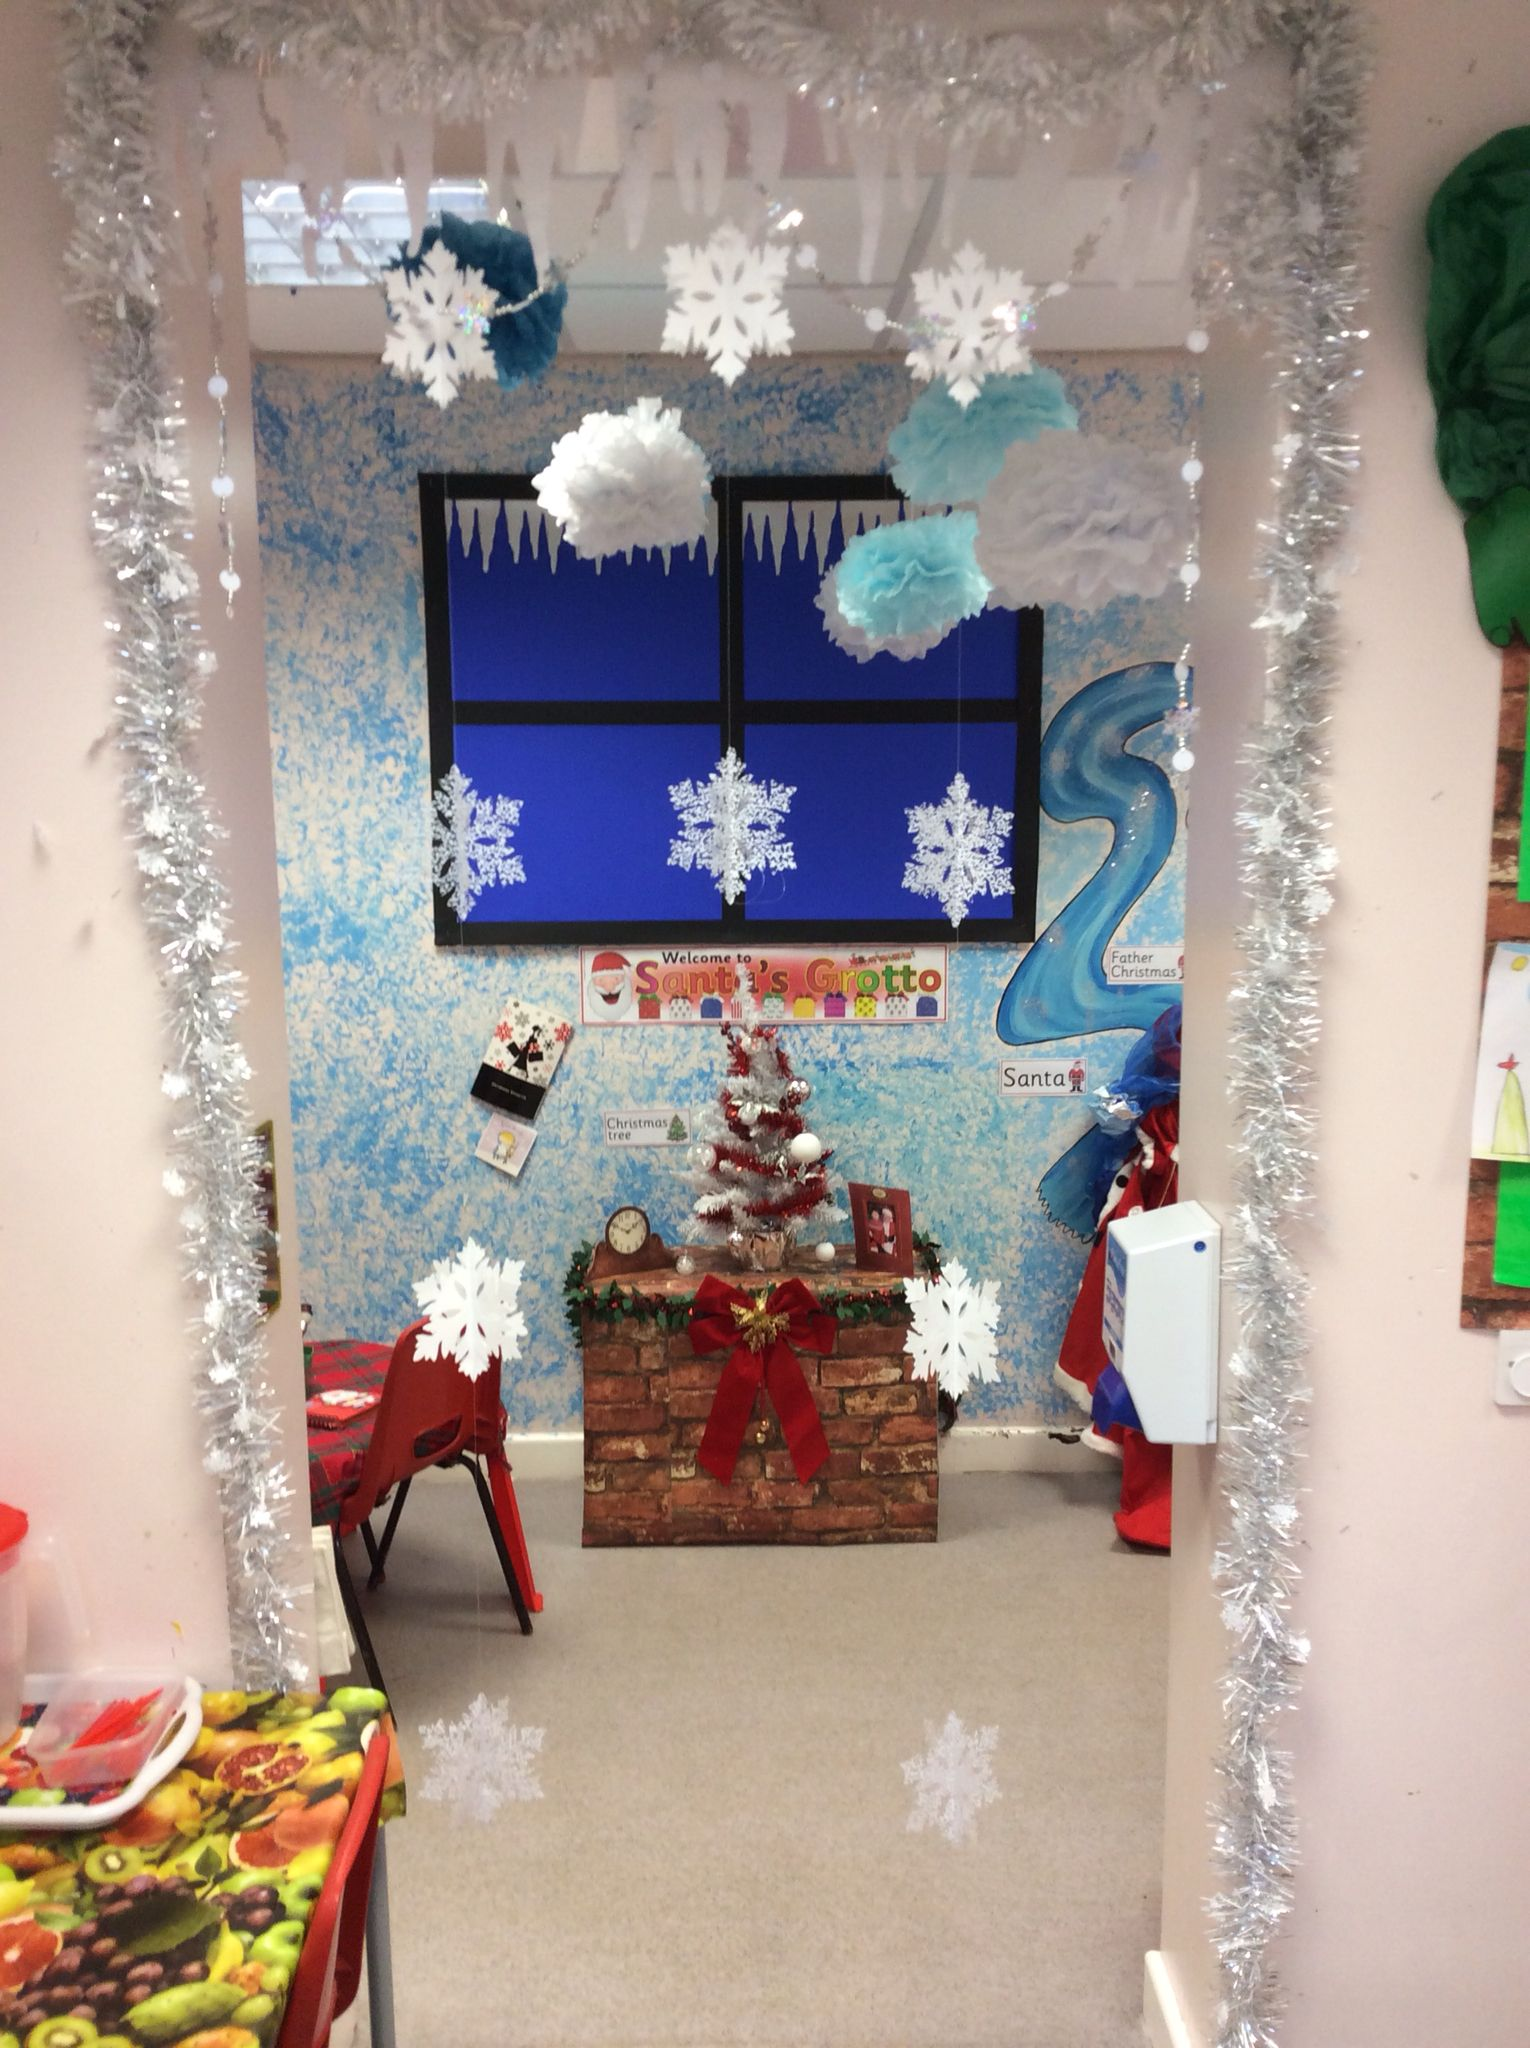 Santa s grotto role play area EYFS January craft